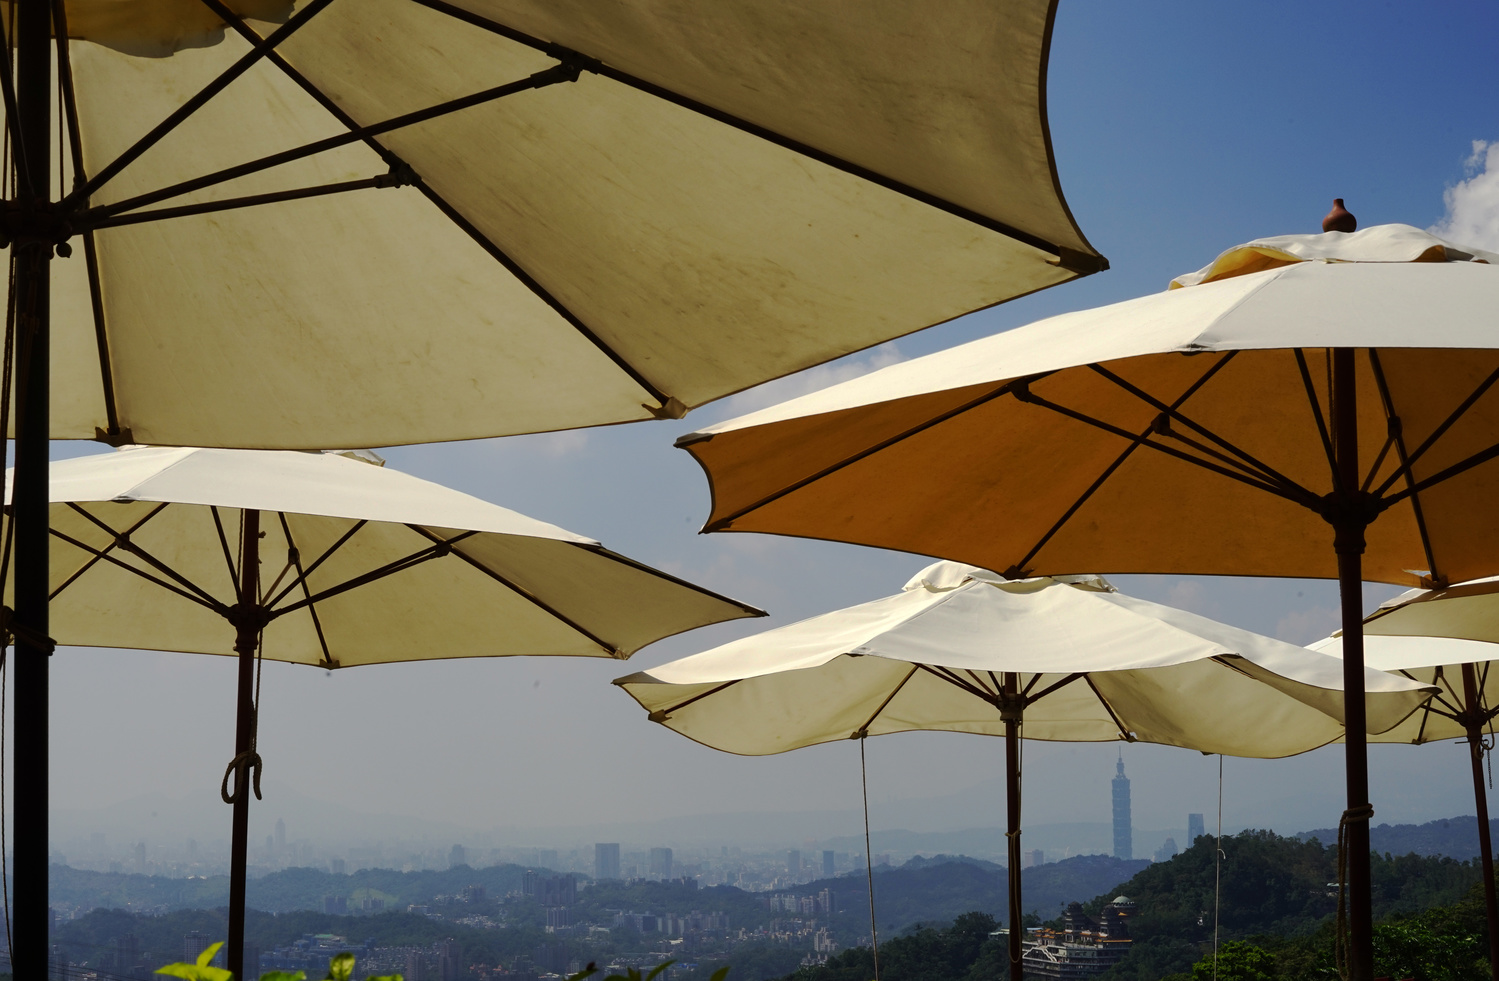 Umbrellas over Taiwan by Bri Kathleen